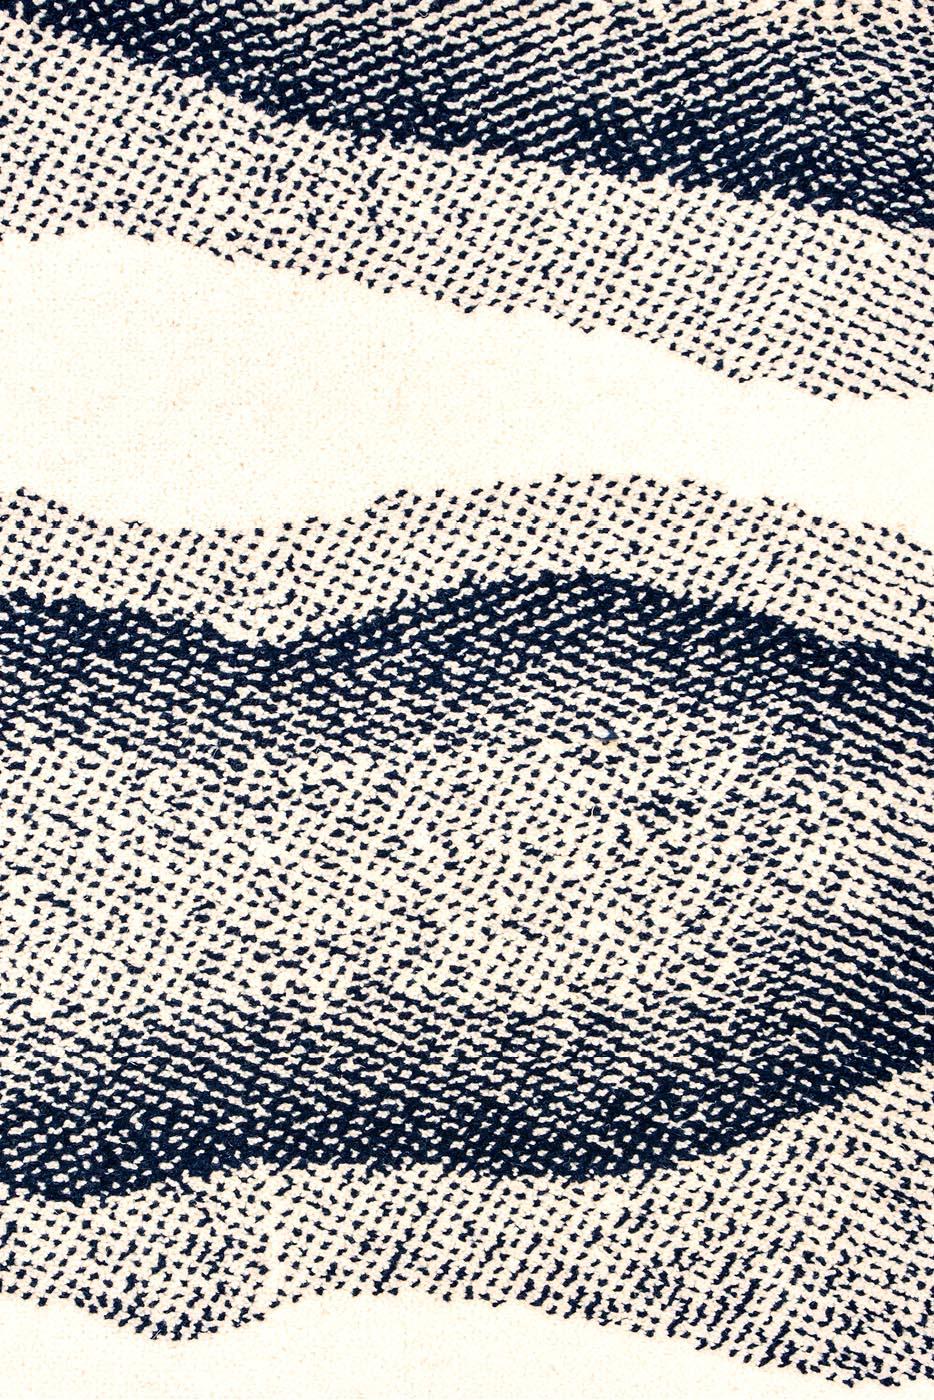 Carpet - Moquette Ondoiement by Alix Waline